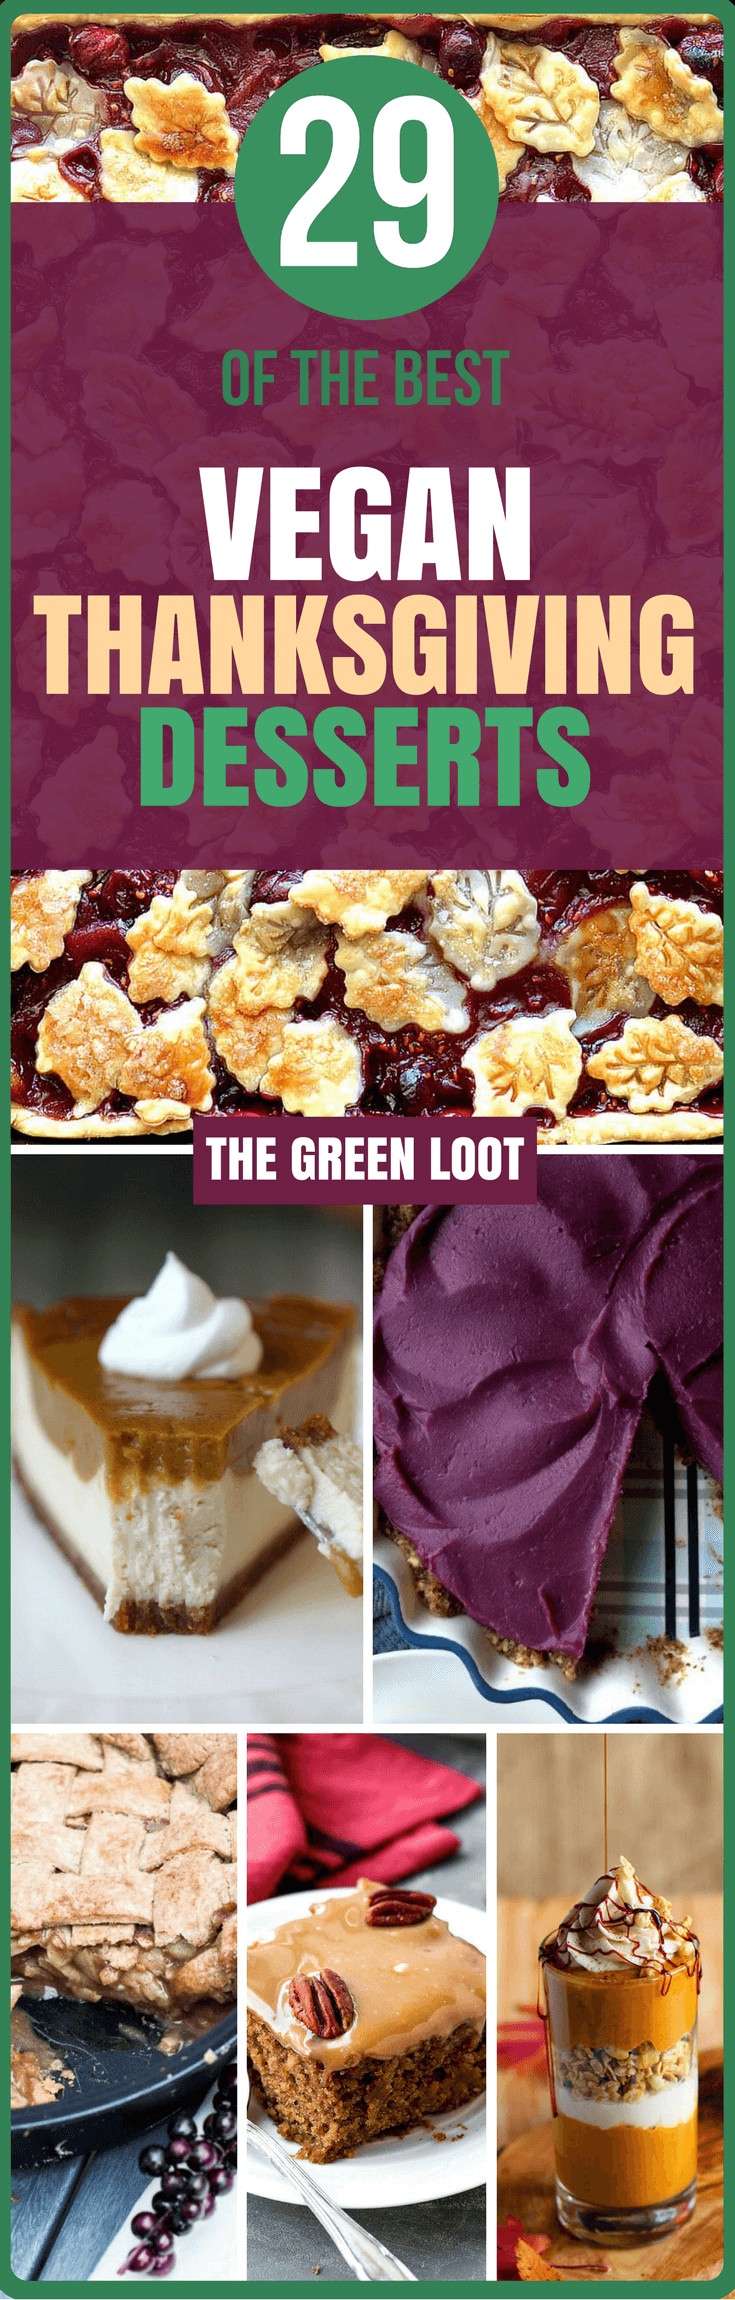 Vegan Thanksgiving Desserts  The Best 29 Vegan Thanksgiving Dessert Recipes The Green